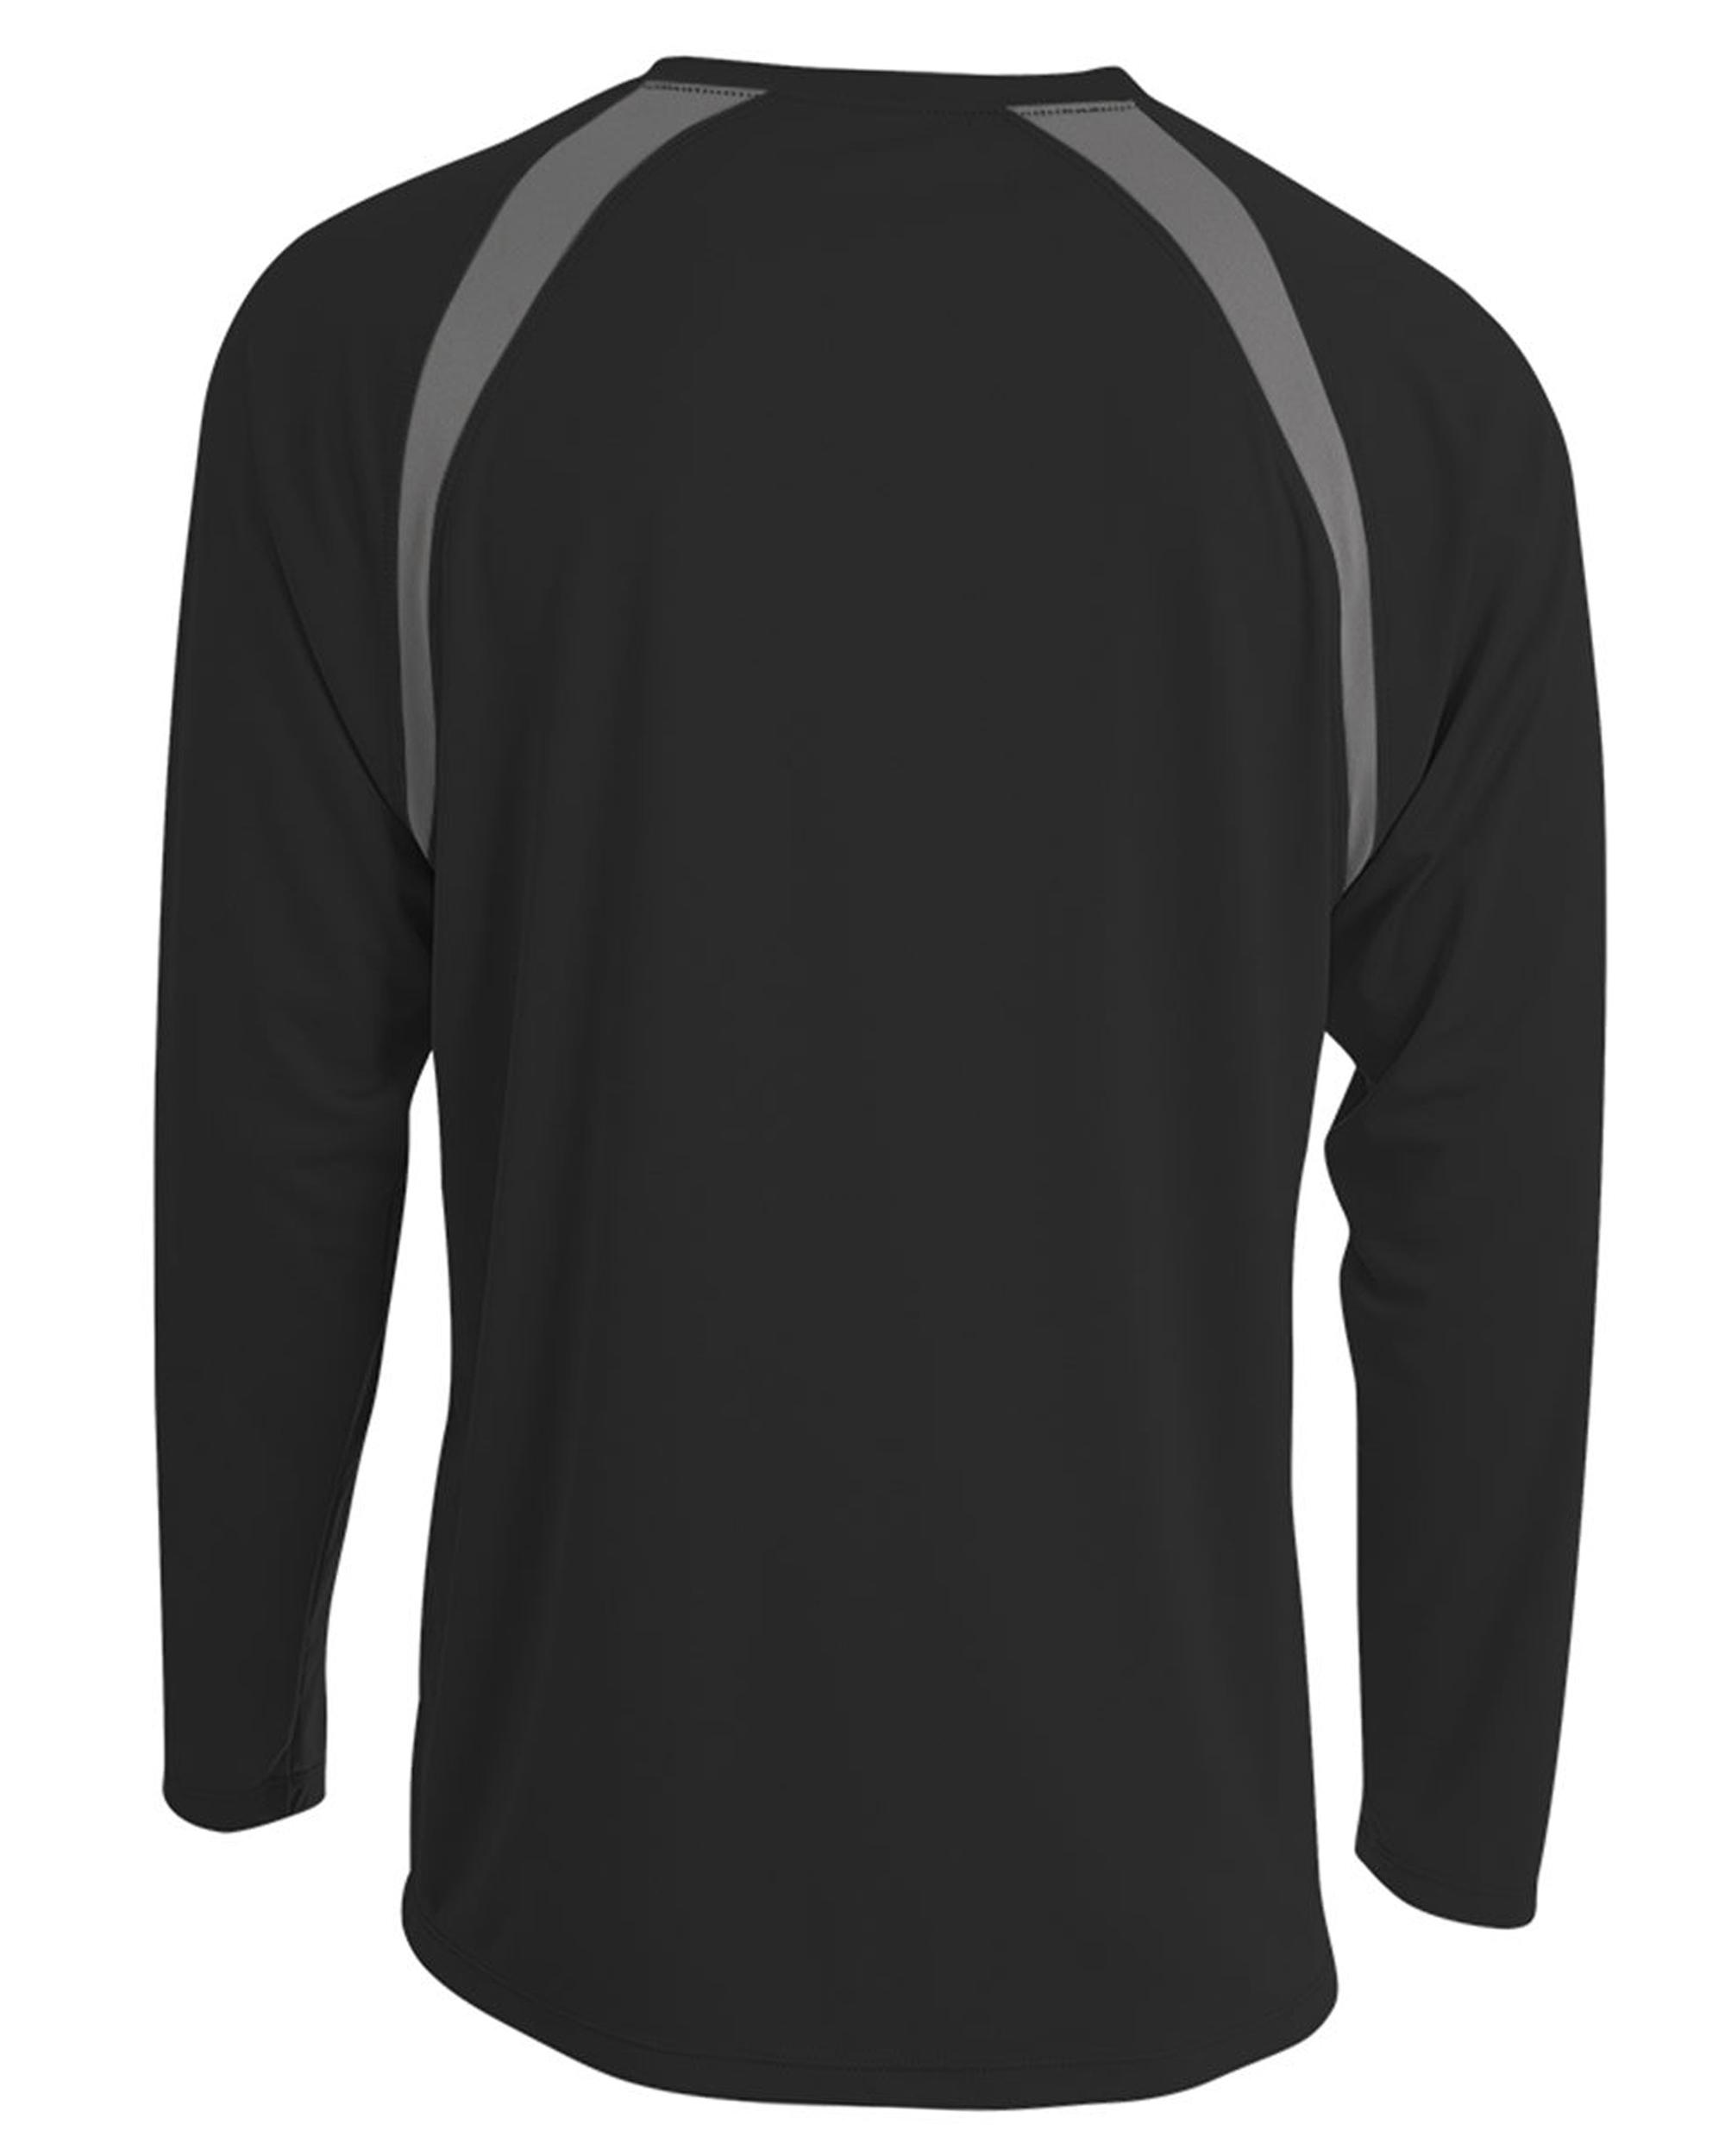 Men-039-s-Long-Sleeve-Loose-Fit-Rash-Guard-Surf-Shirt-Water-Sports-Swimwear thumbnail 6